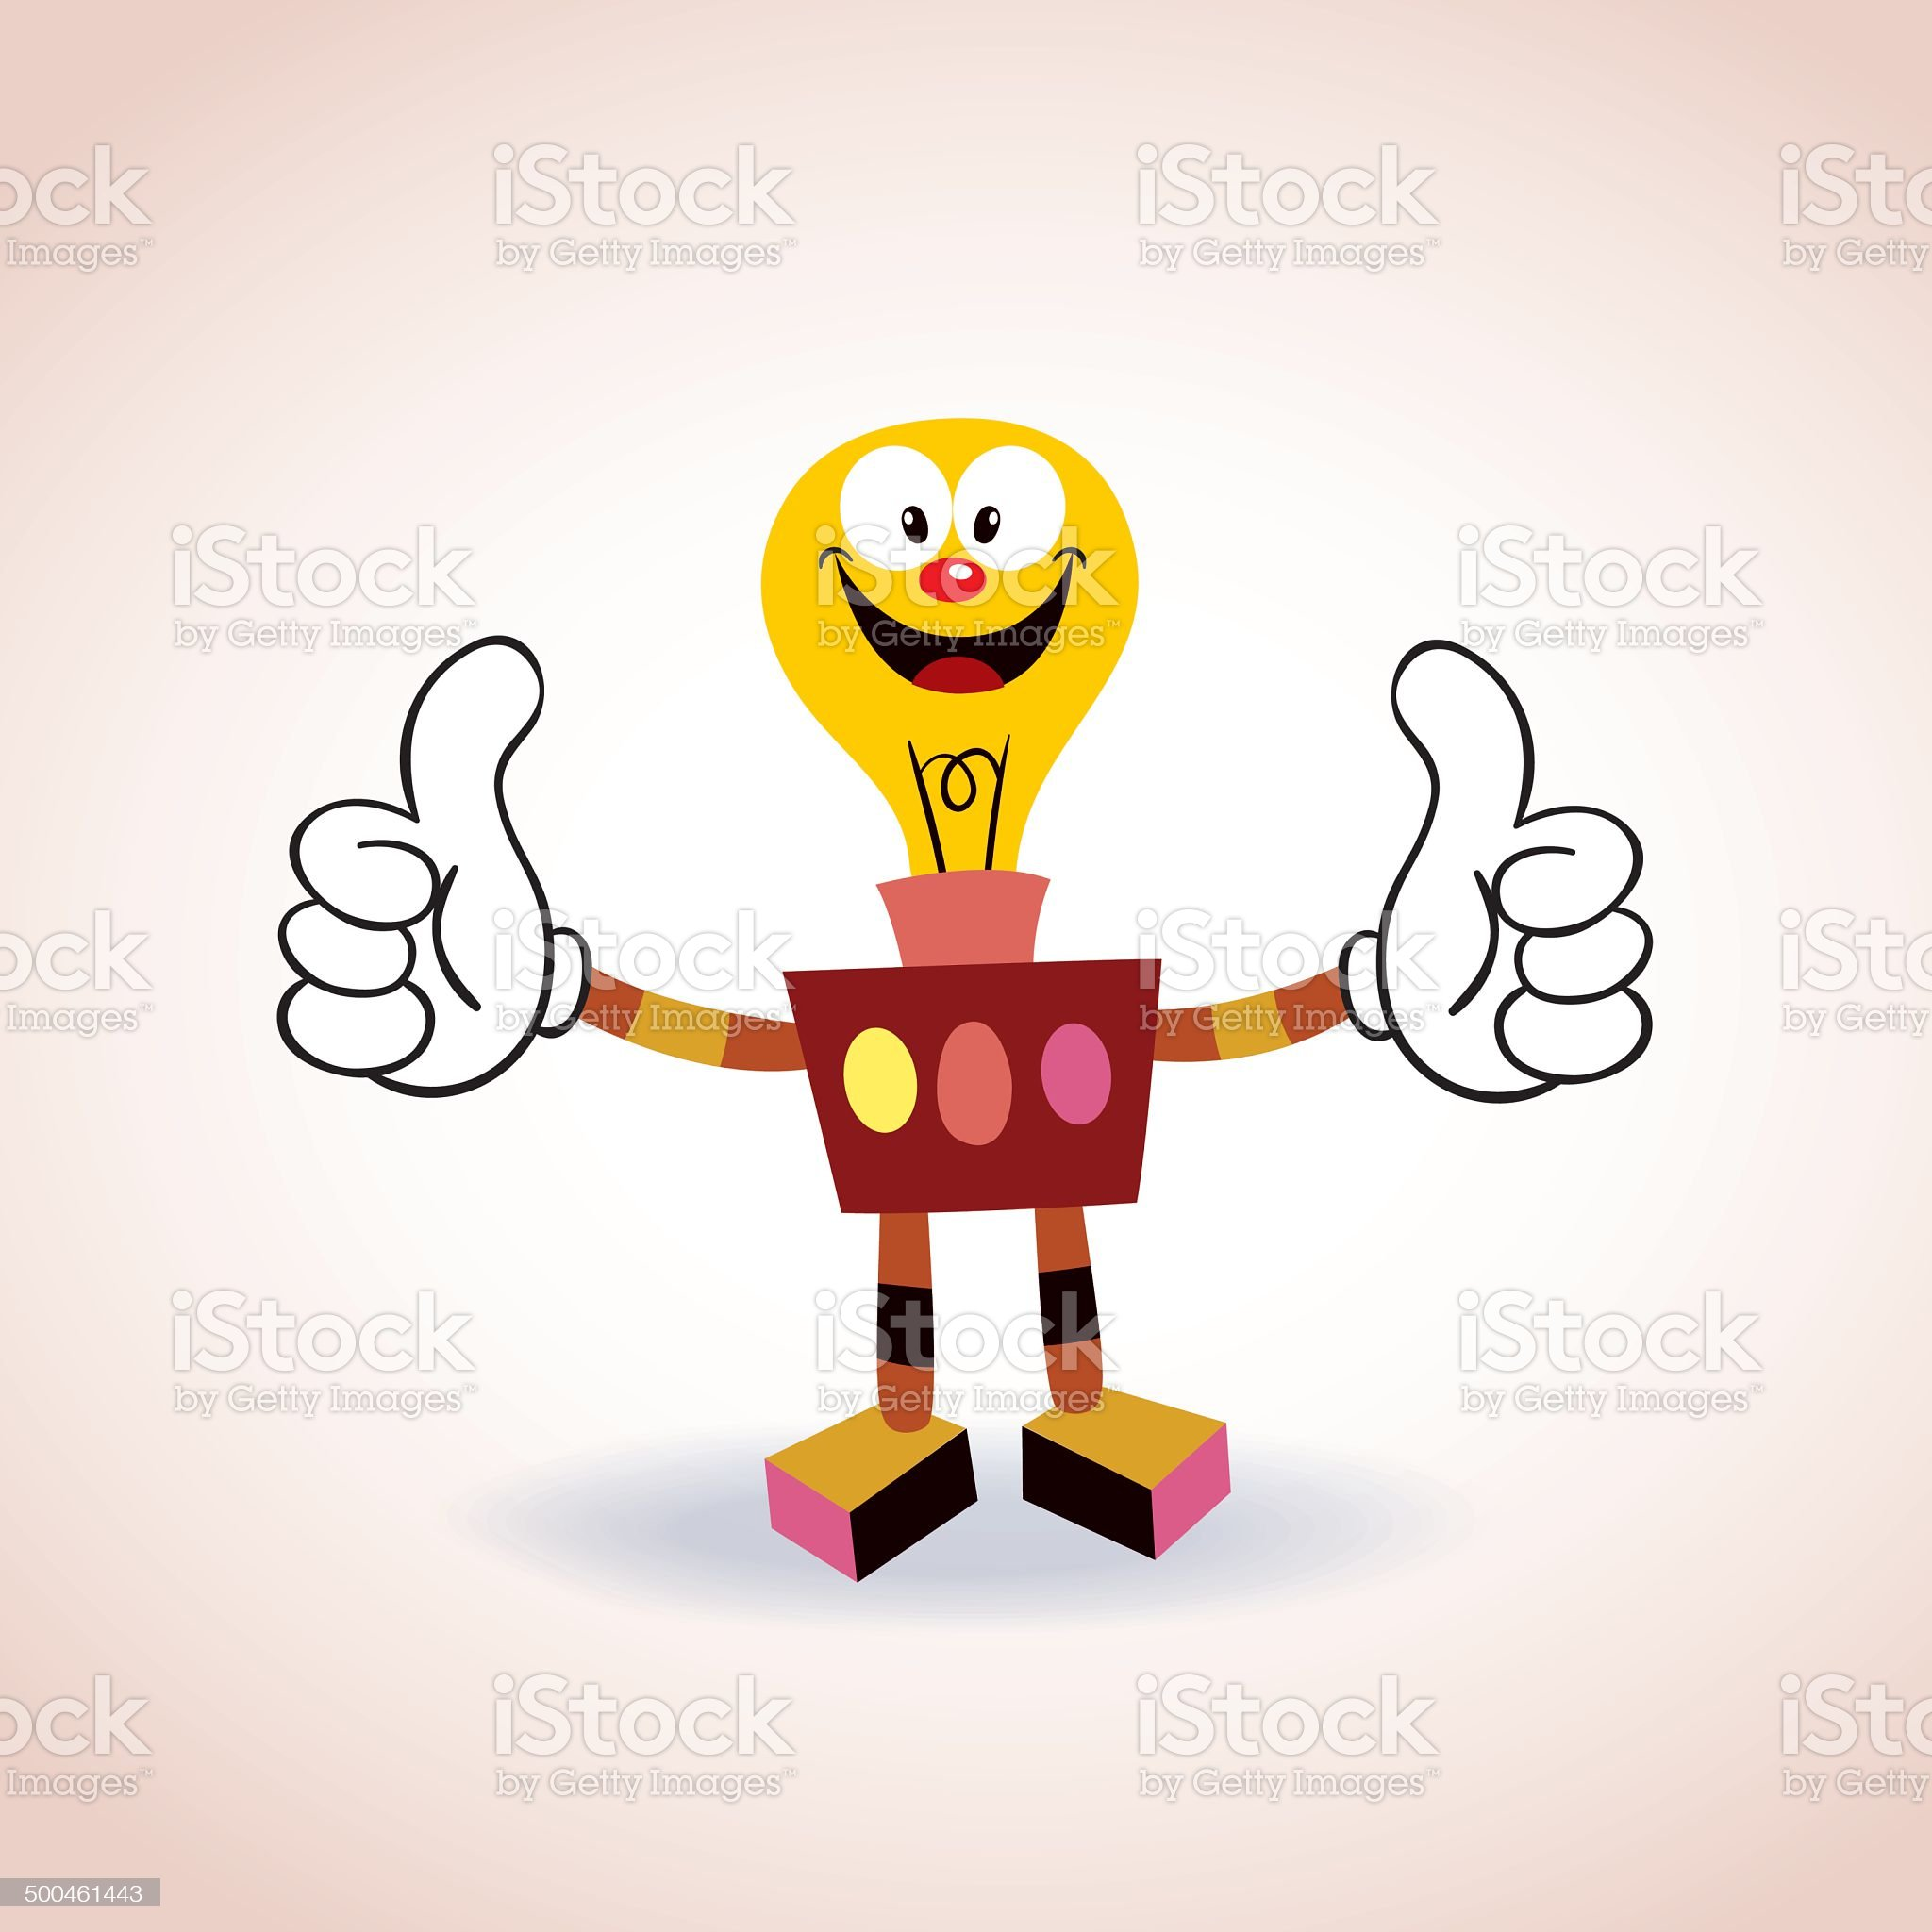 light bulb robot mascot cartoon character royalty-free stock vector art